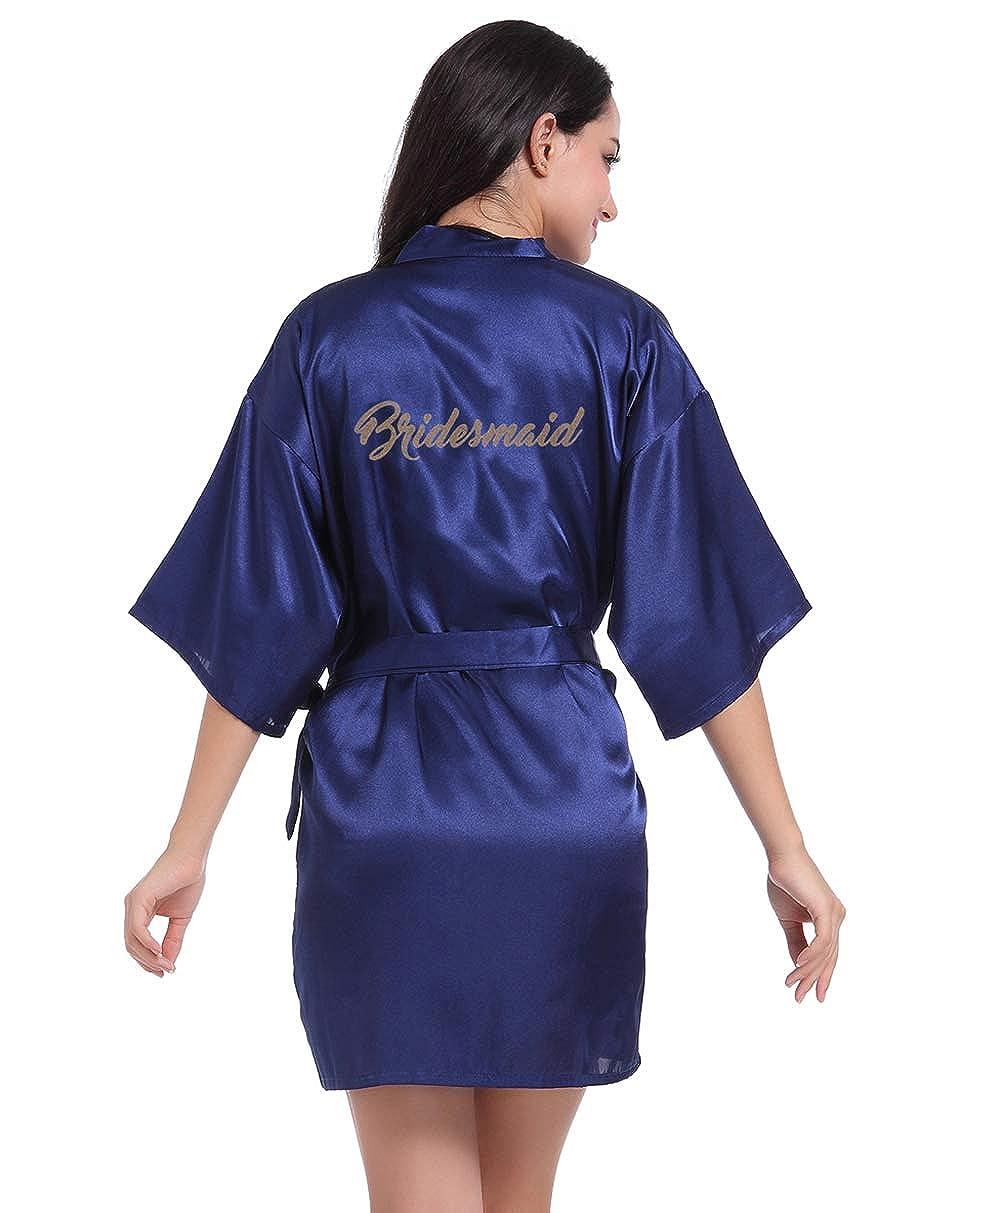 13e2841e06 Hammia Vestido de Novia de Satén Robe Mujeres Corto Vestido de Dama de  Honor Pijama de